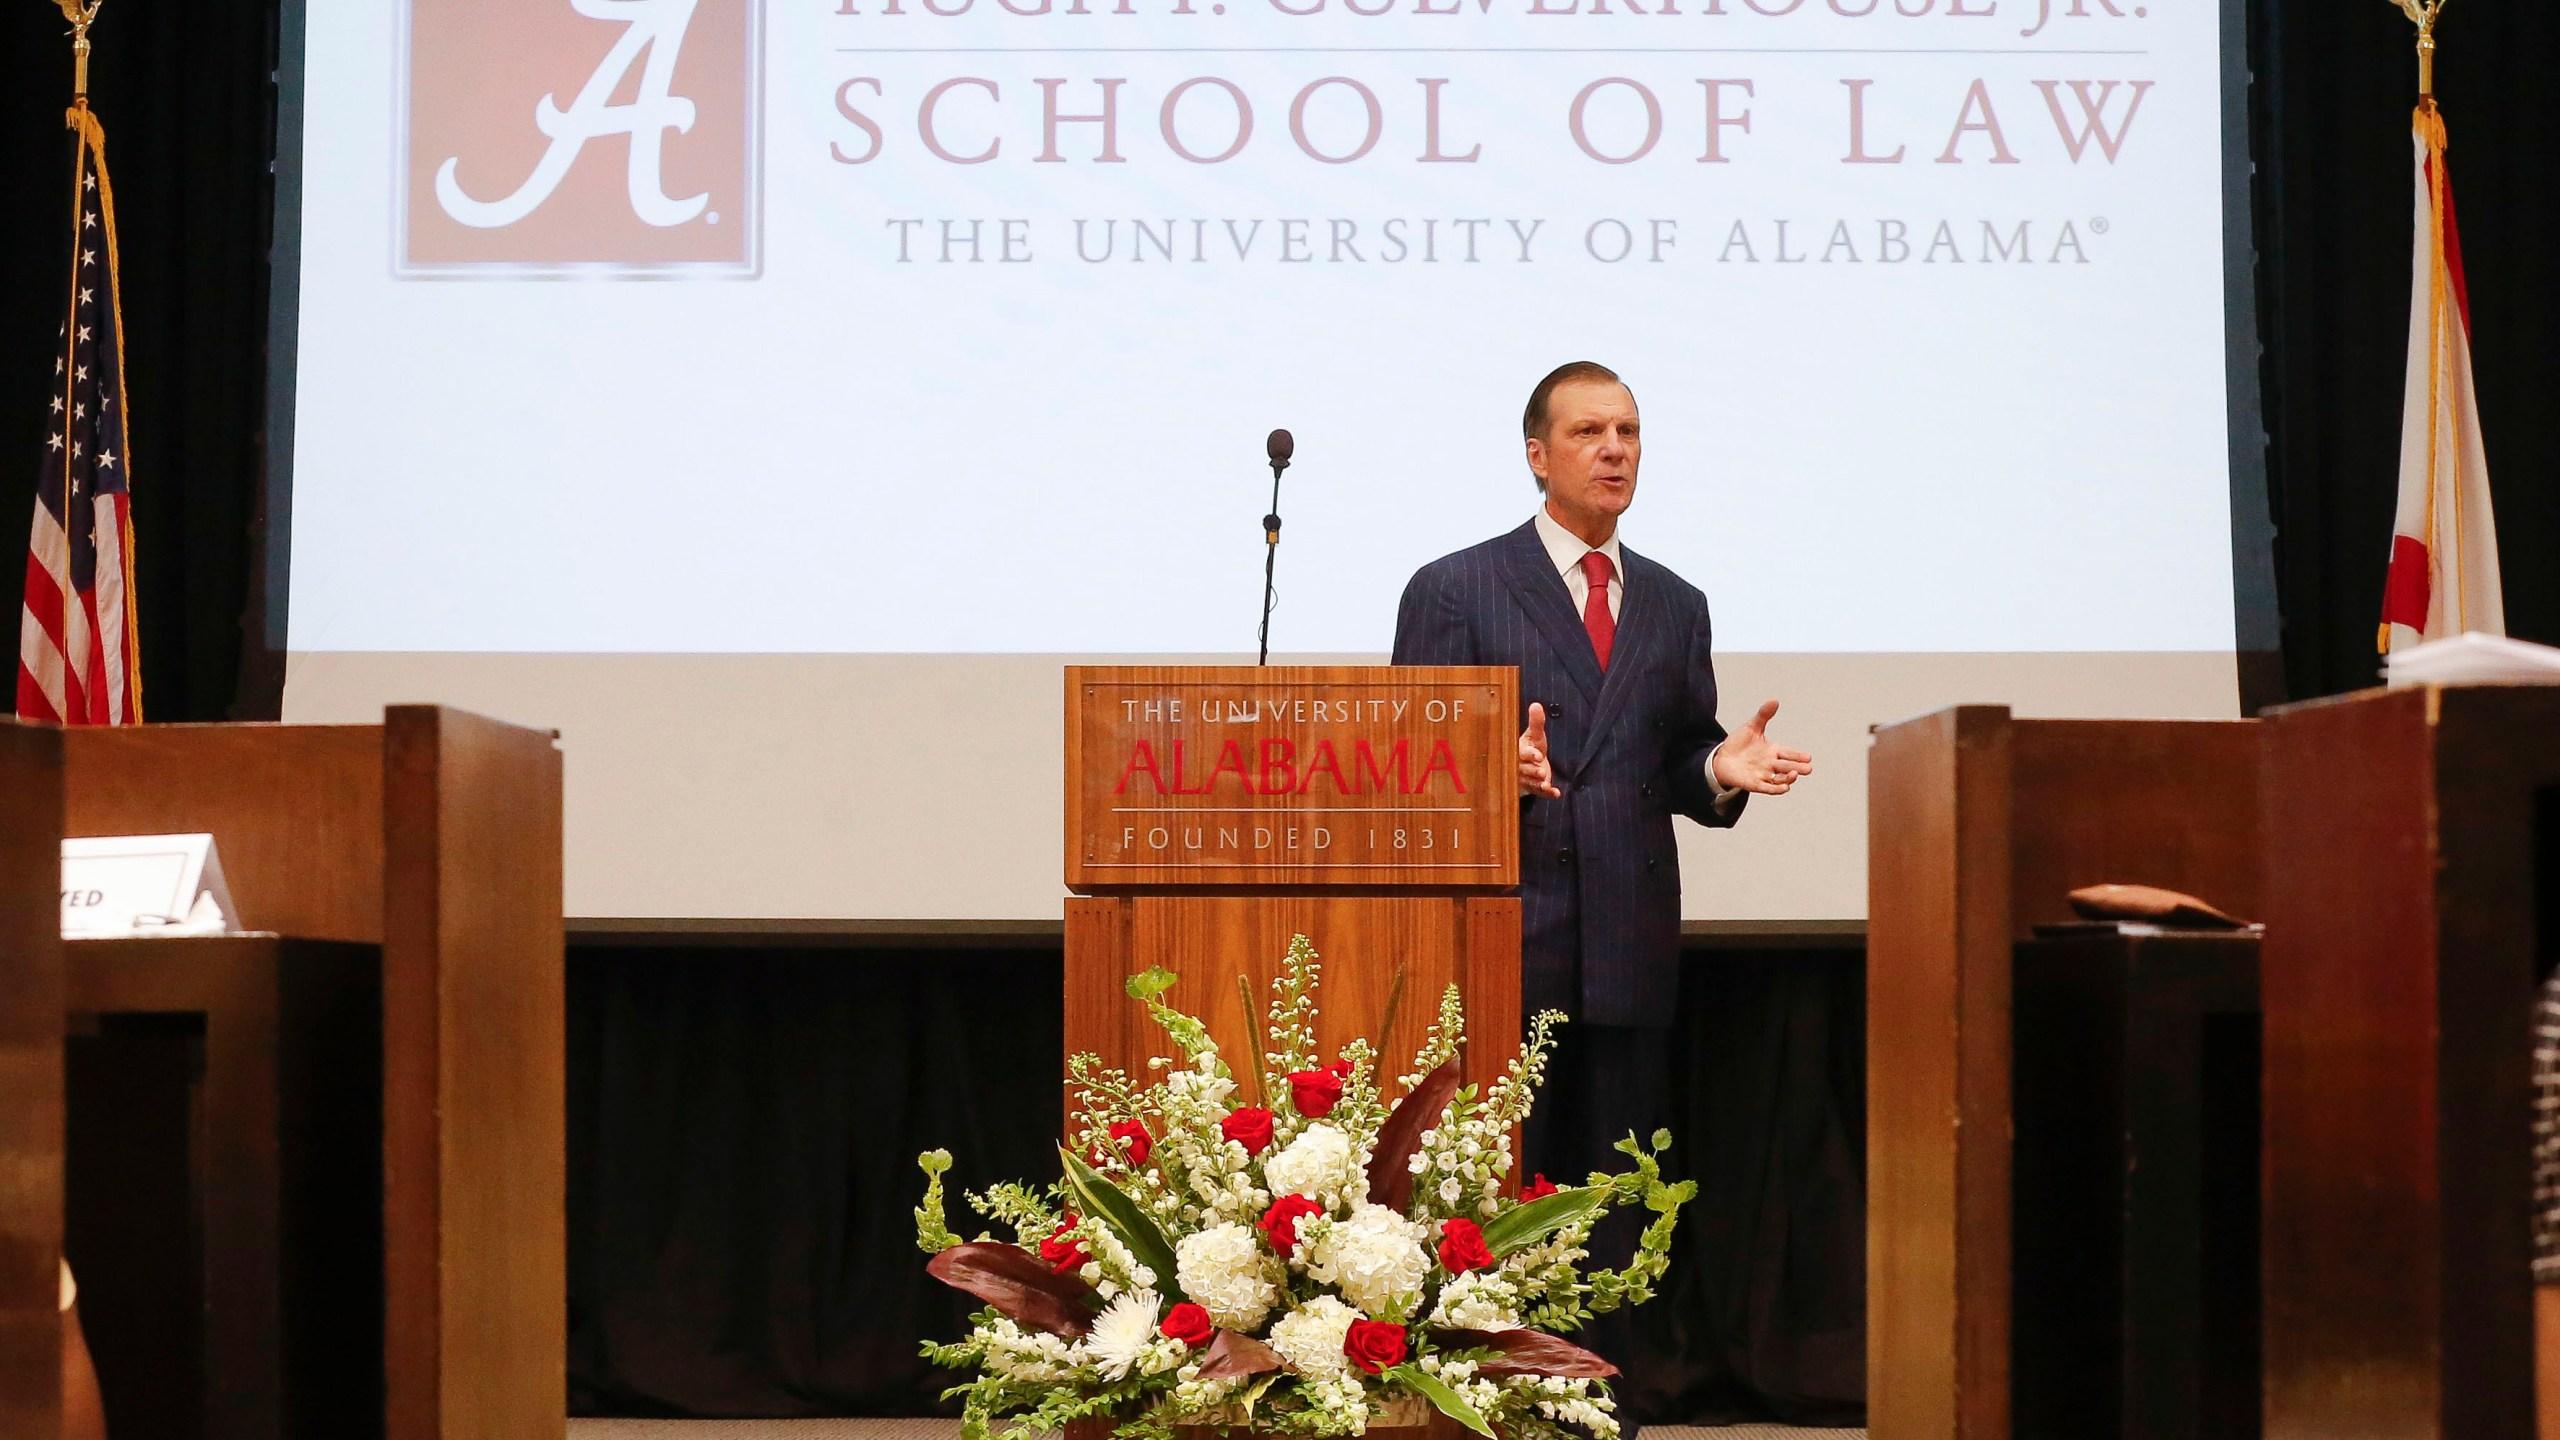 University_of_Alabama_Abortion_86868-159532.jpg73545548